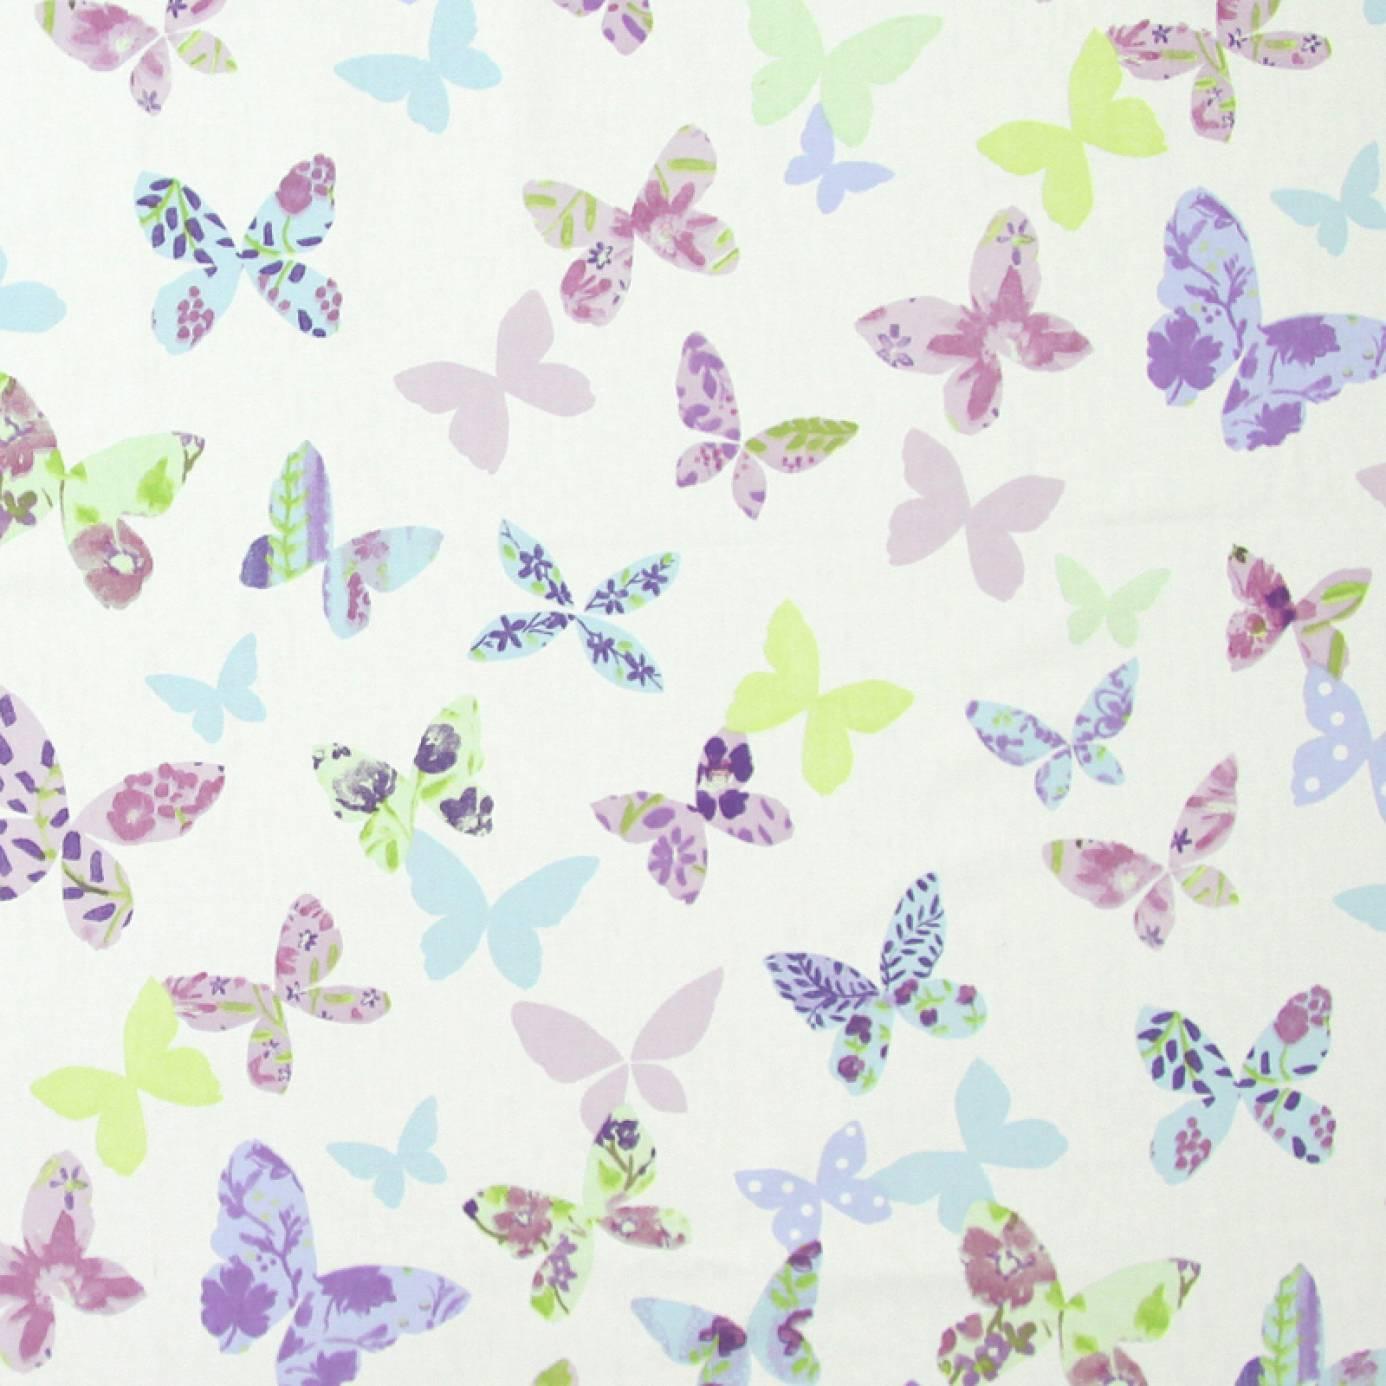 Butterfly Fabric Lavender 5860 805 Prestigious